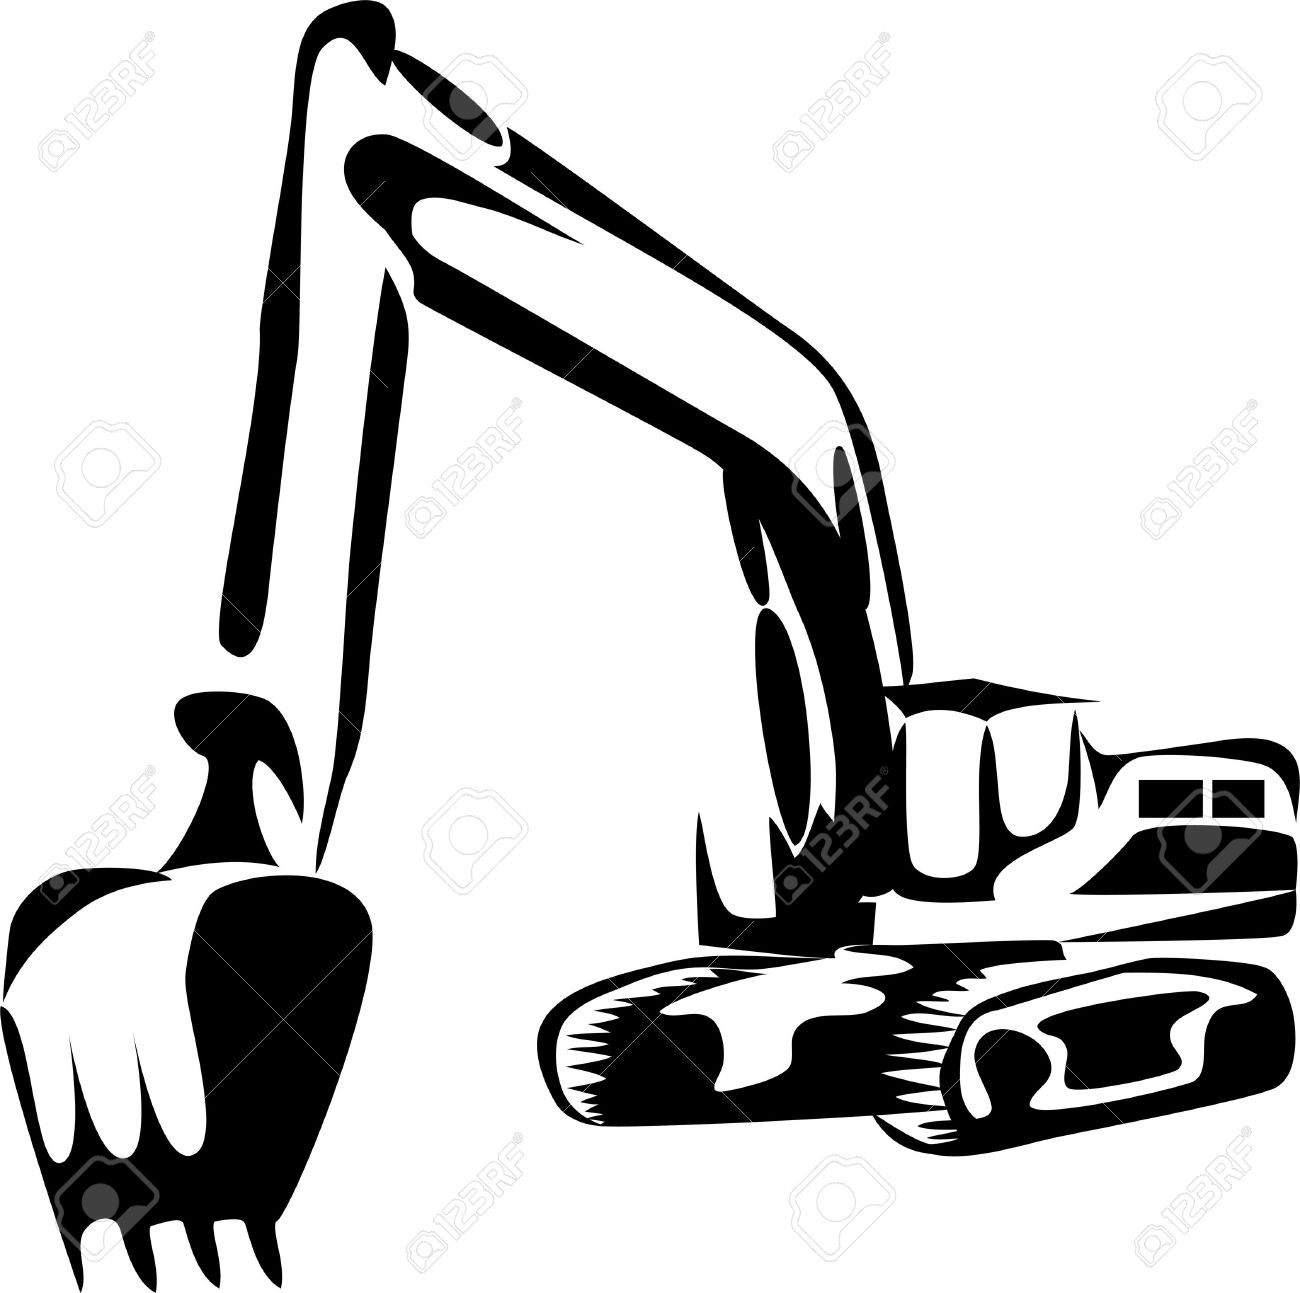 Excavator clipart excavator arm. Backhoe drawing at getdrawings